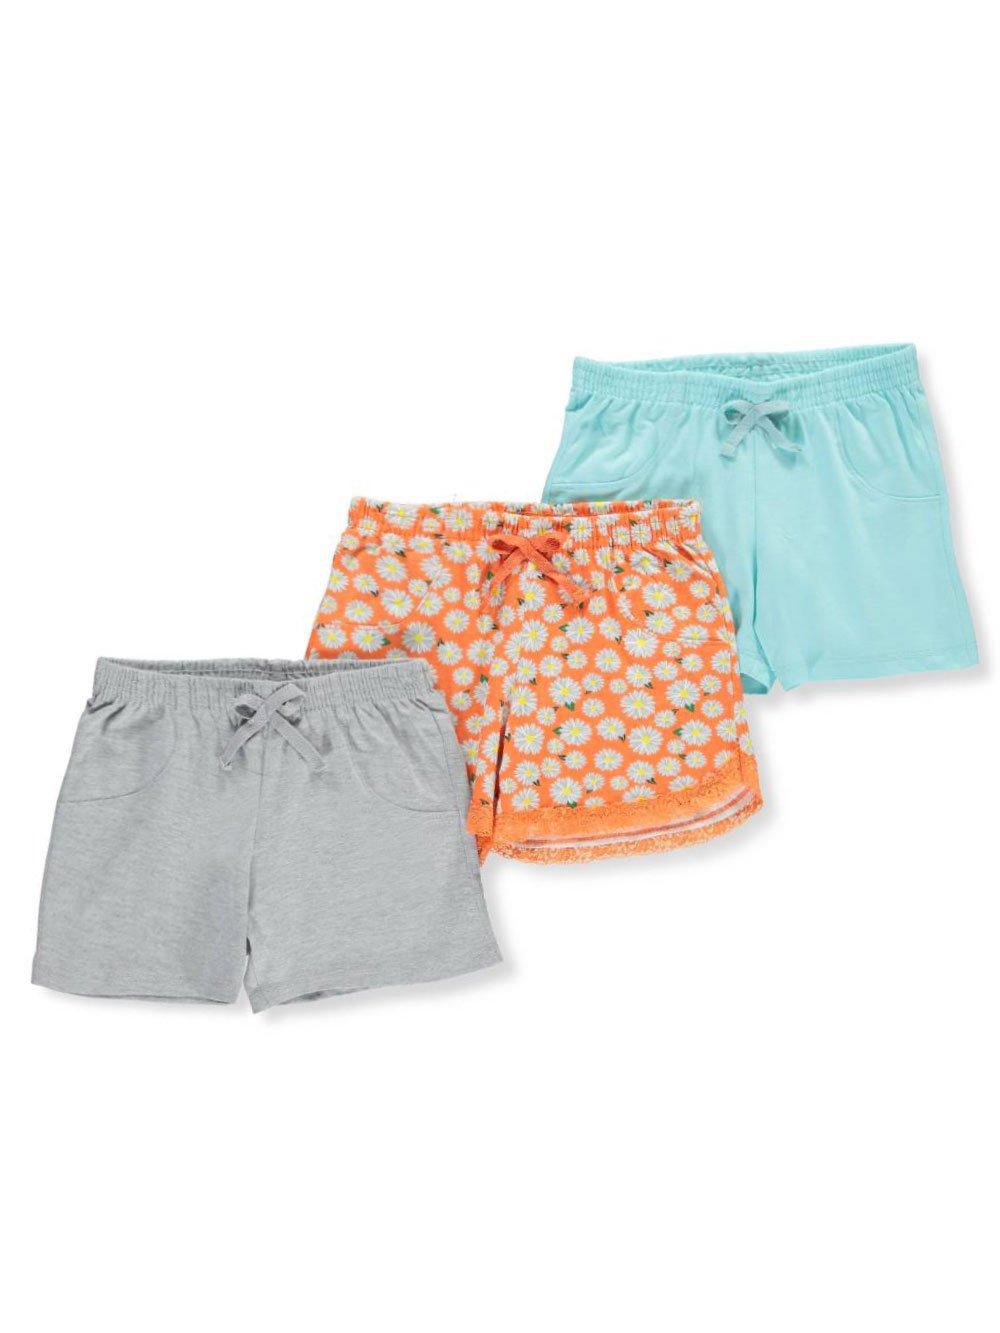 Pink Dot Girls' 3-Pack Shorts 6X